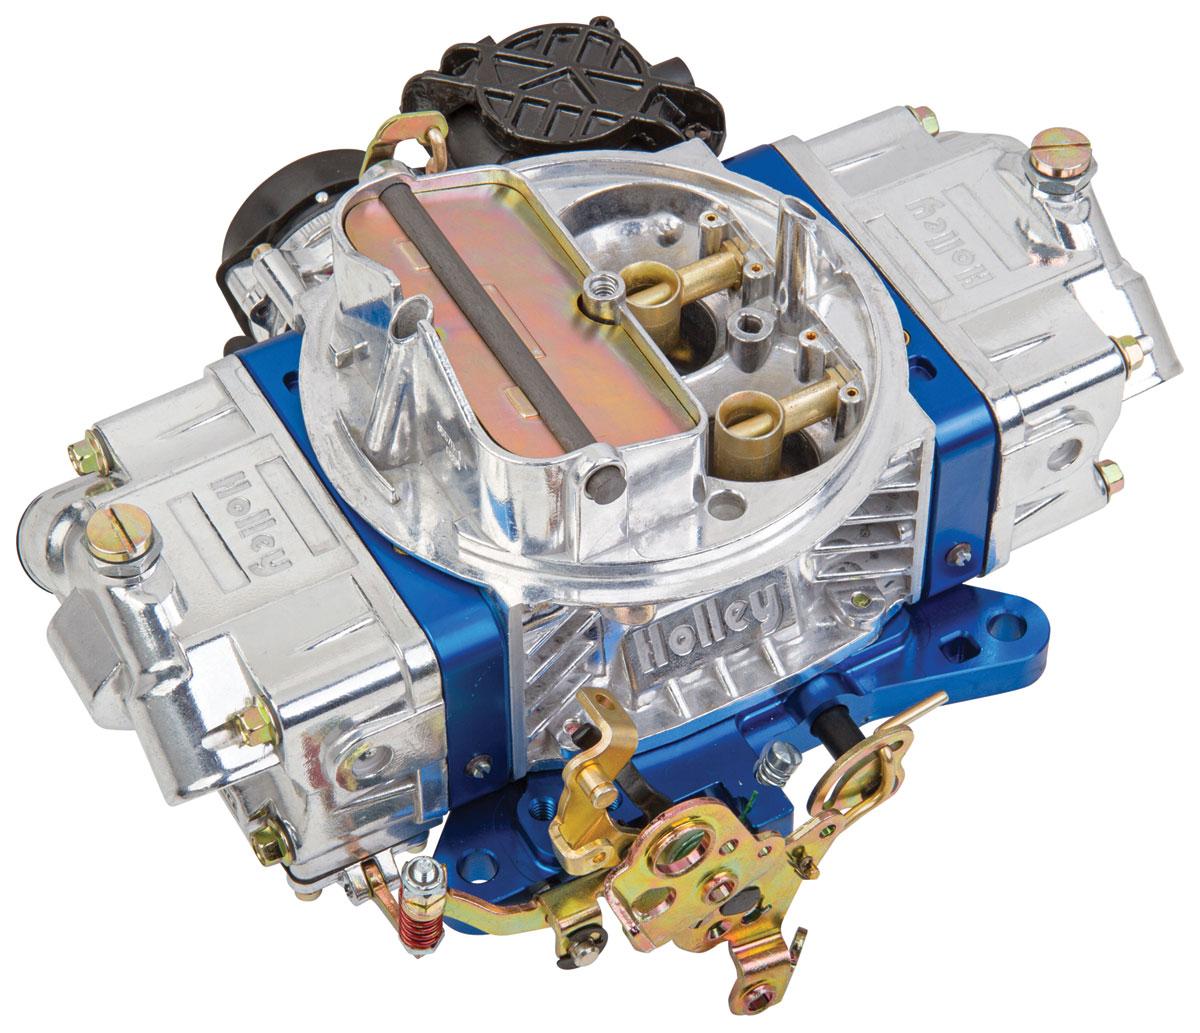 Carburetor, Holley, 670 CFM Ultra Street Avenger, Blue Metering Blocks